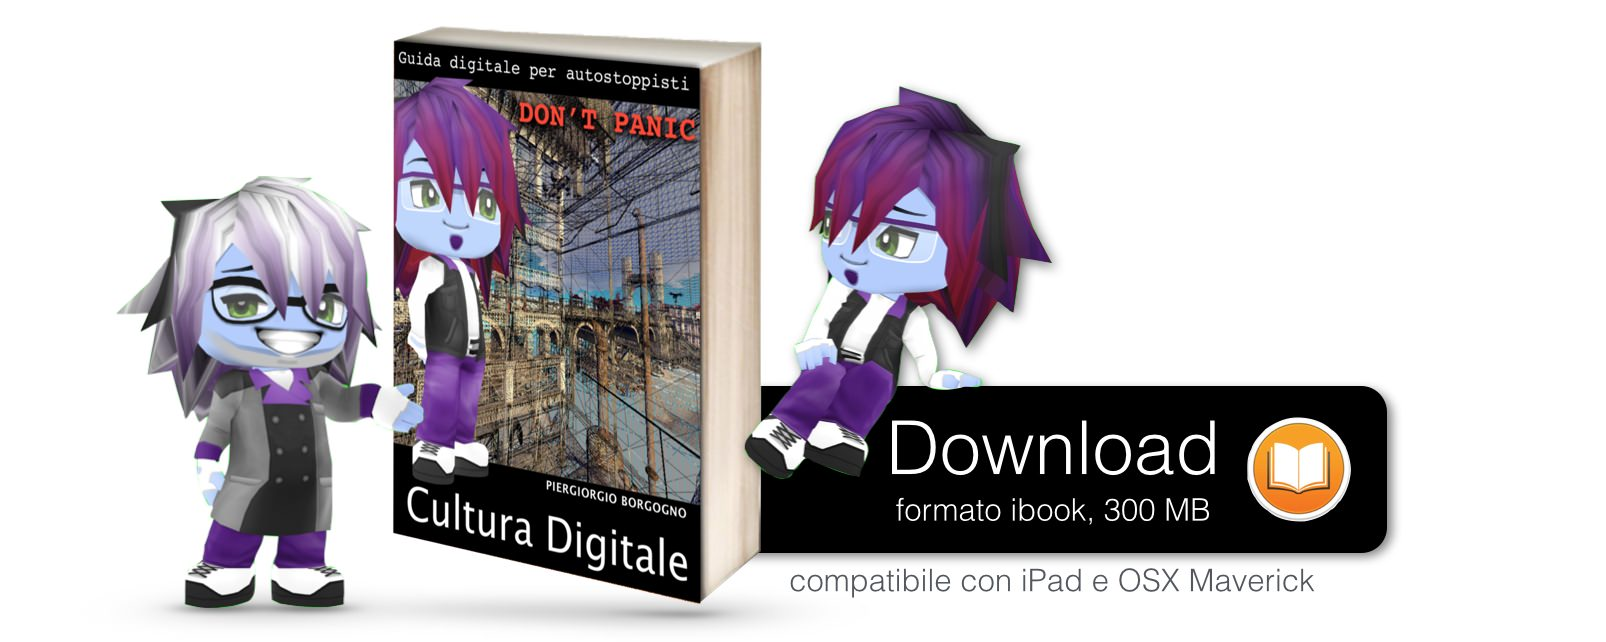 download cultura digitale